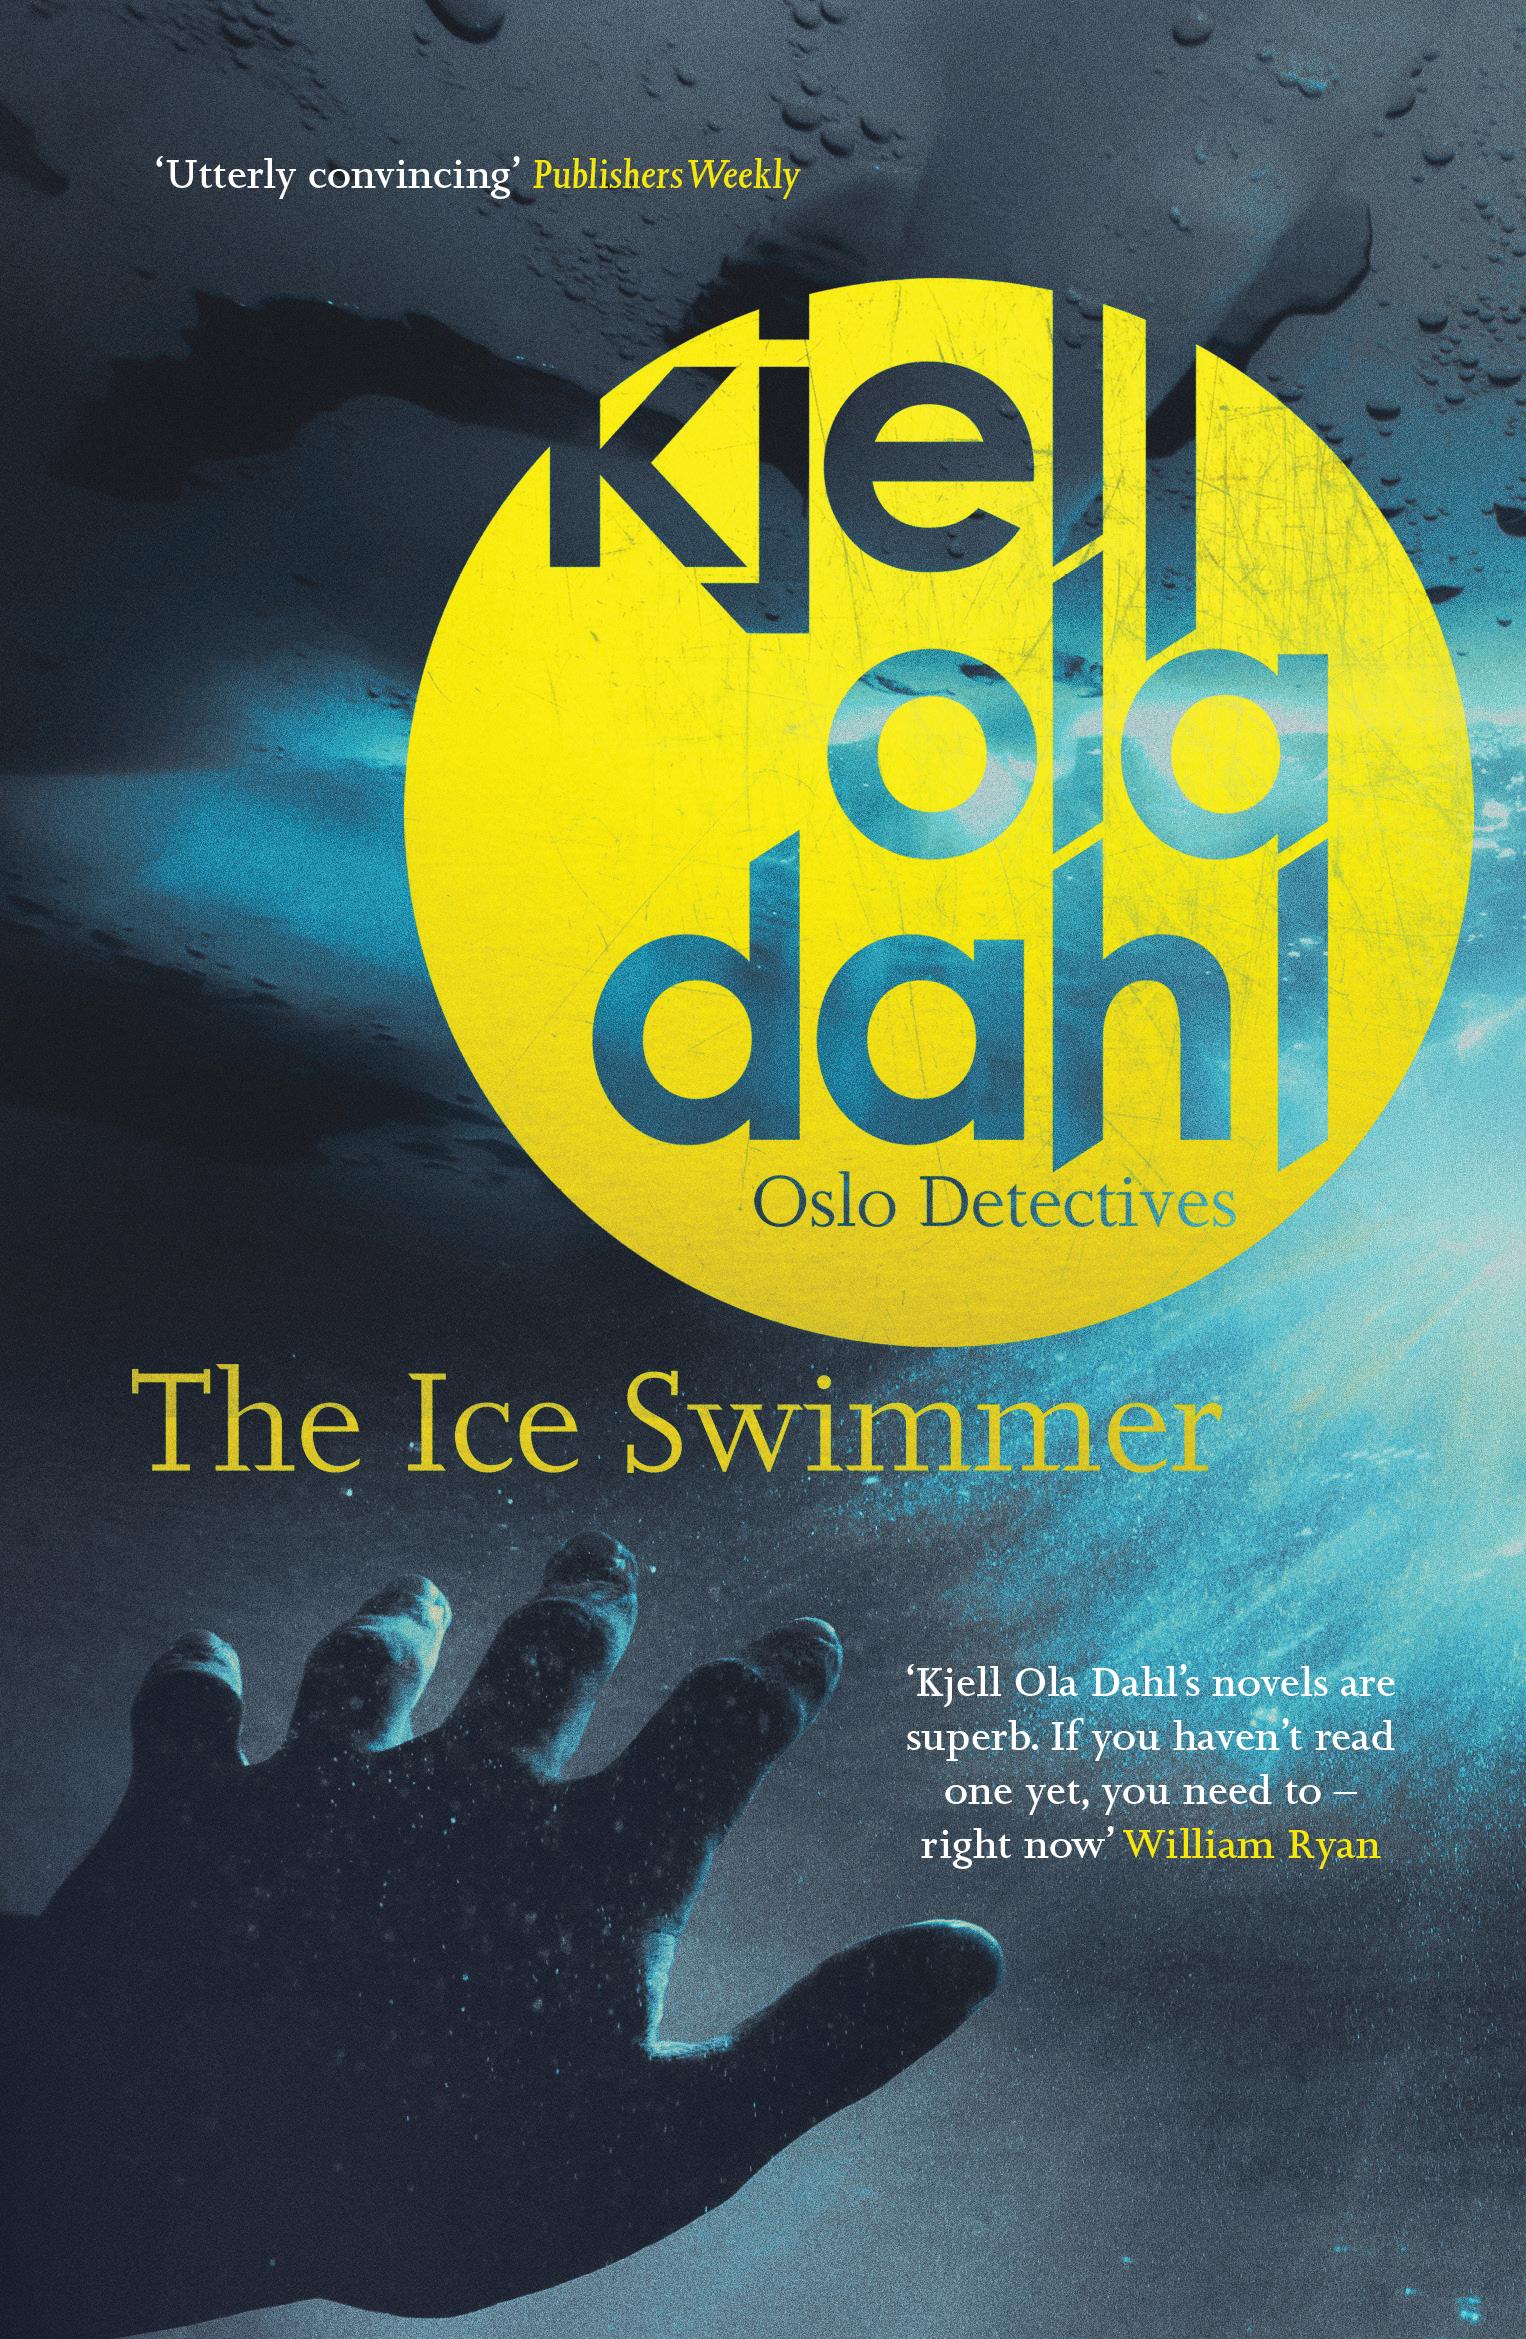 The Ice Swimmer cover.jpg